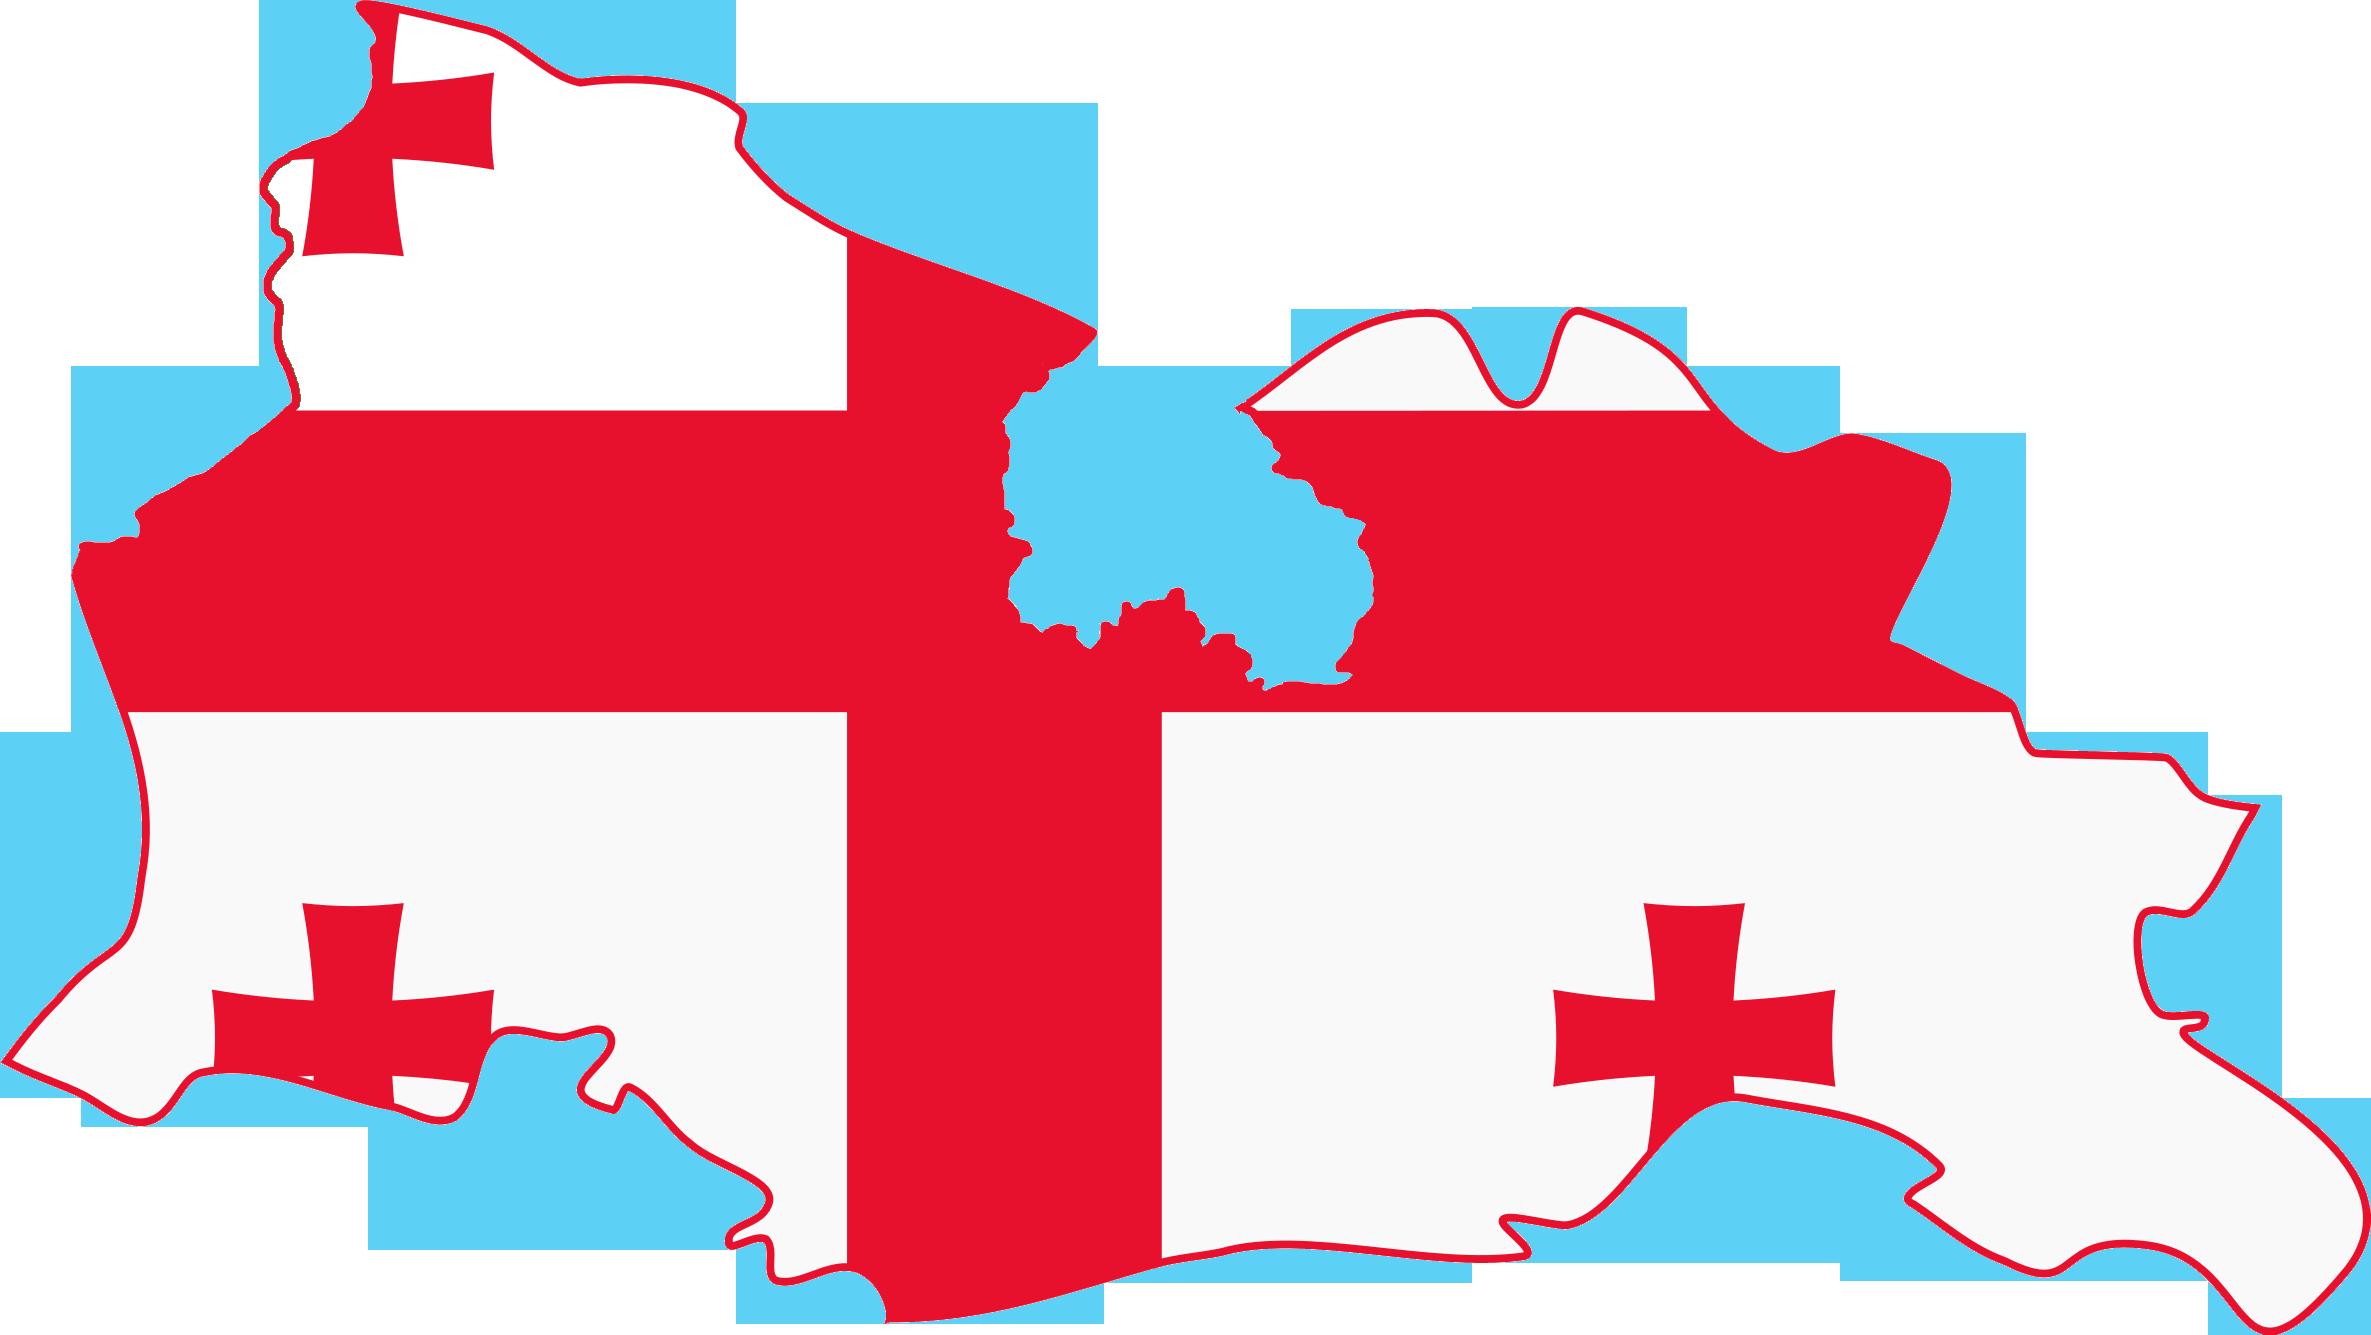 georgia vs belarus online dating